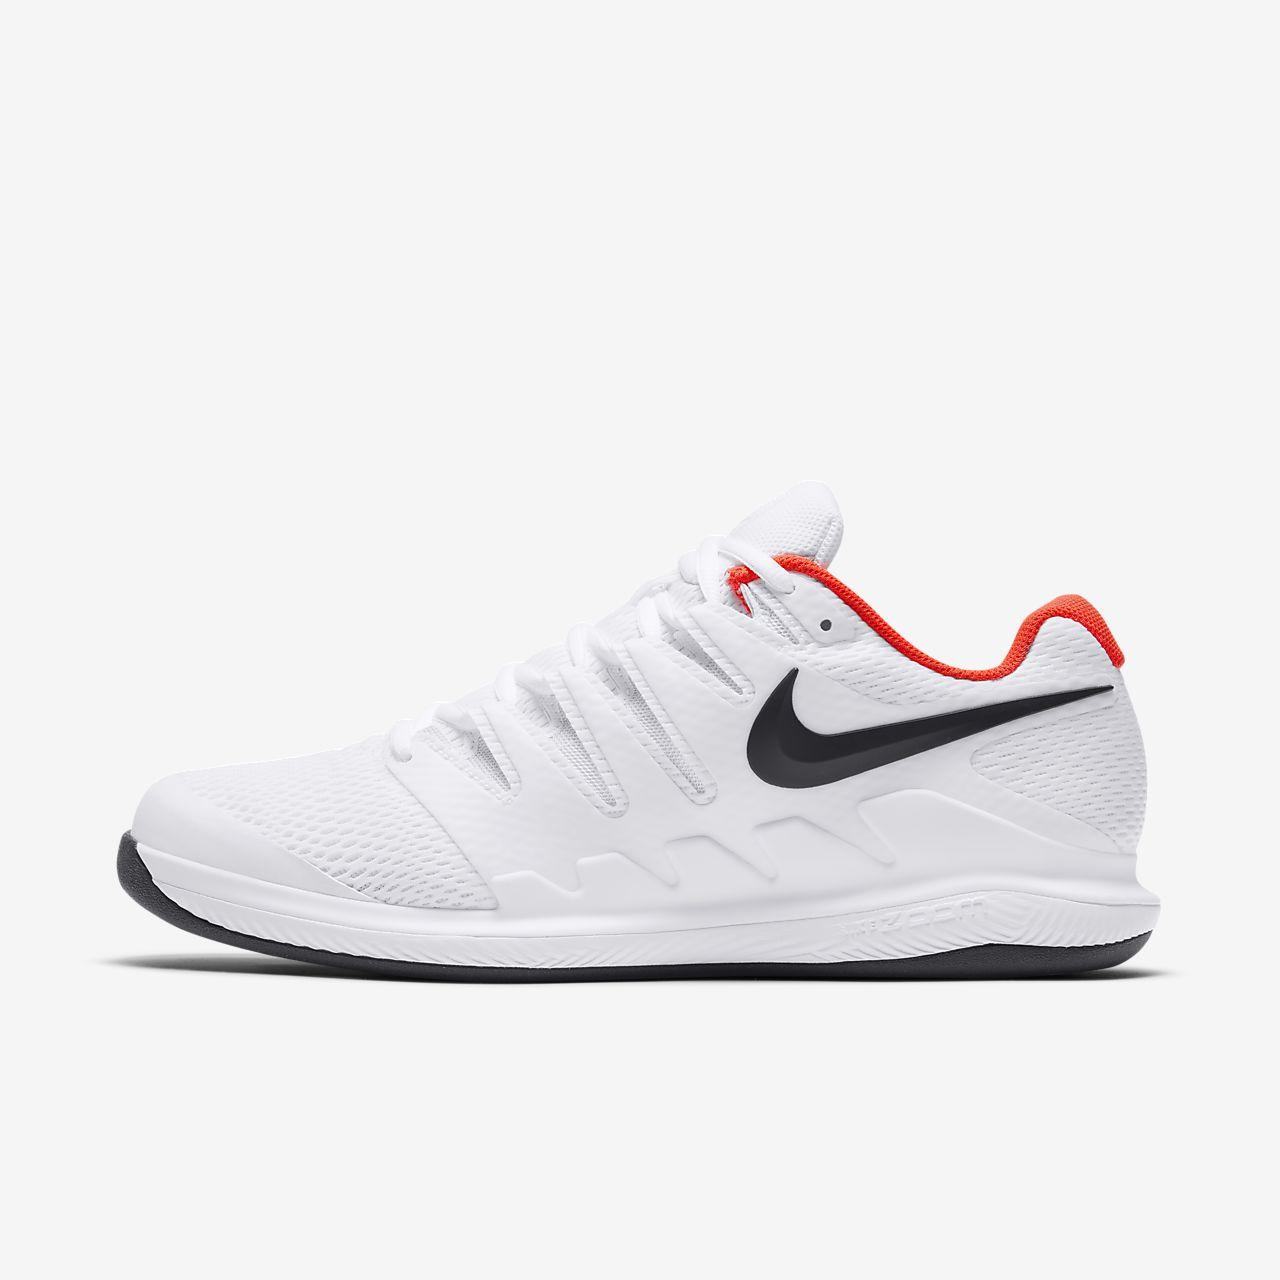 Carpet X Tenis De Zapatillas Nike Hombre Air Vapor Zoom 3l1cuTJFK